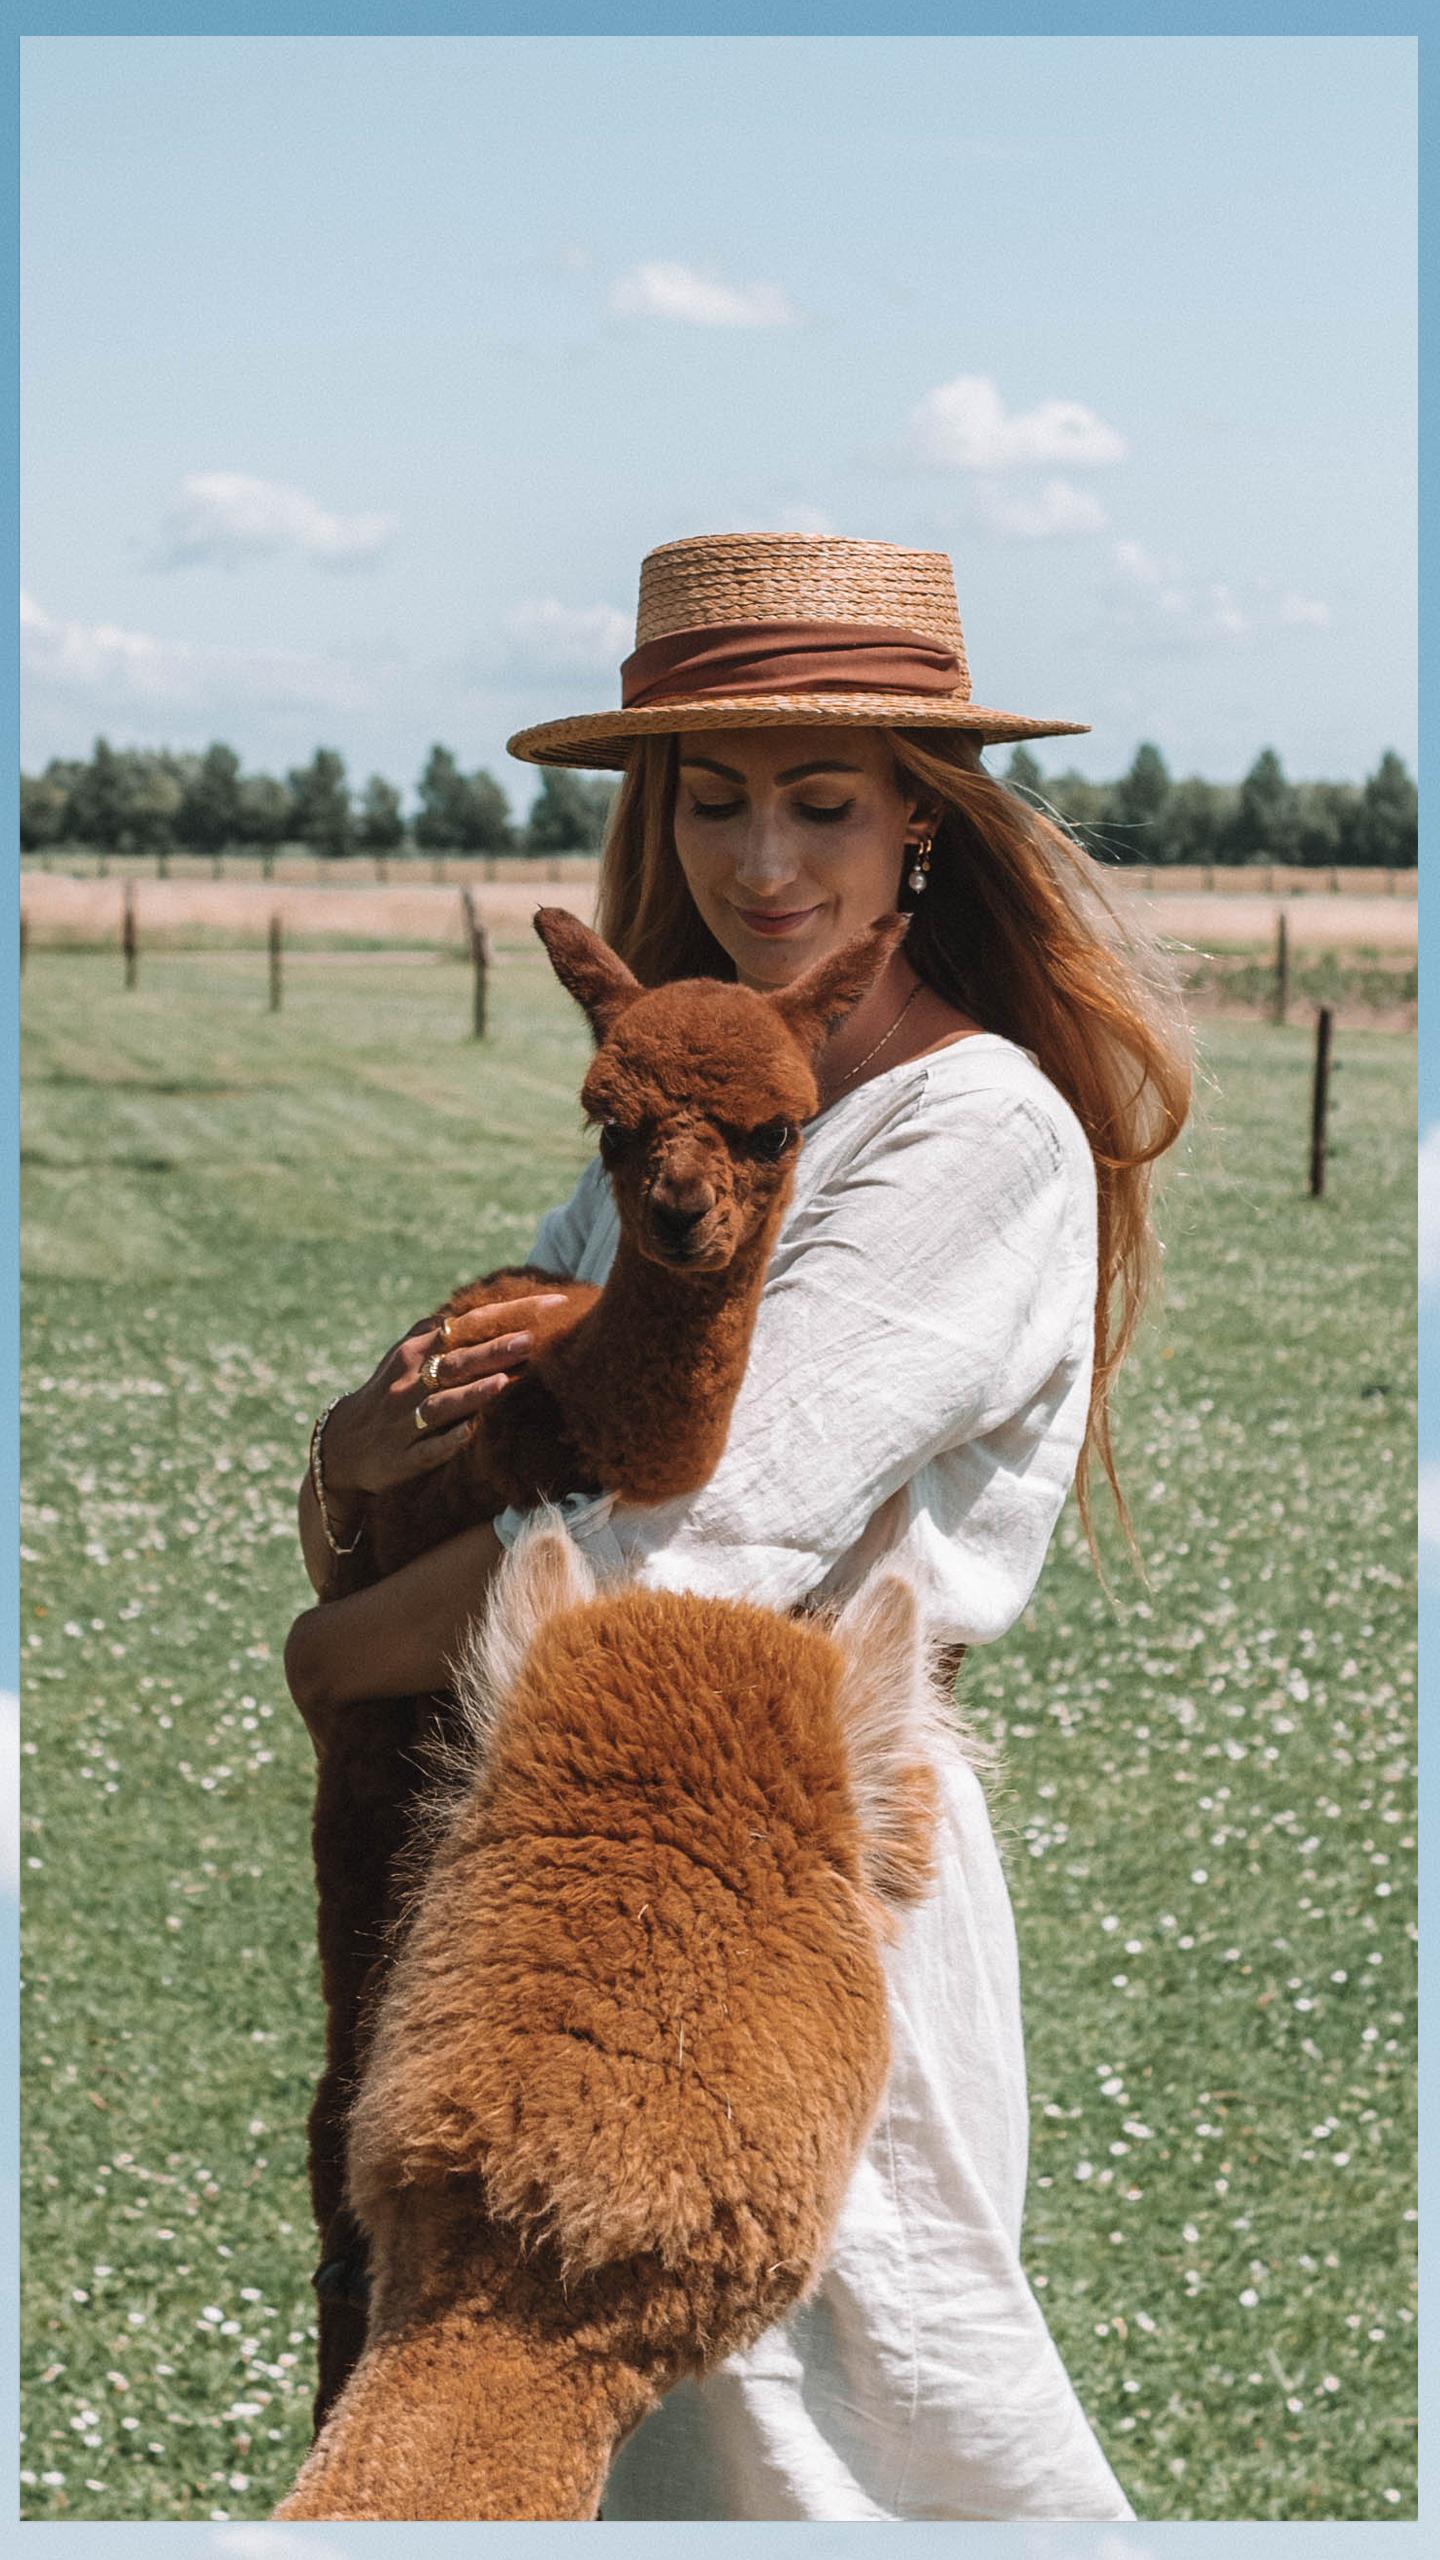 Welkom Freek alpaca cria